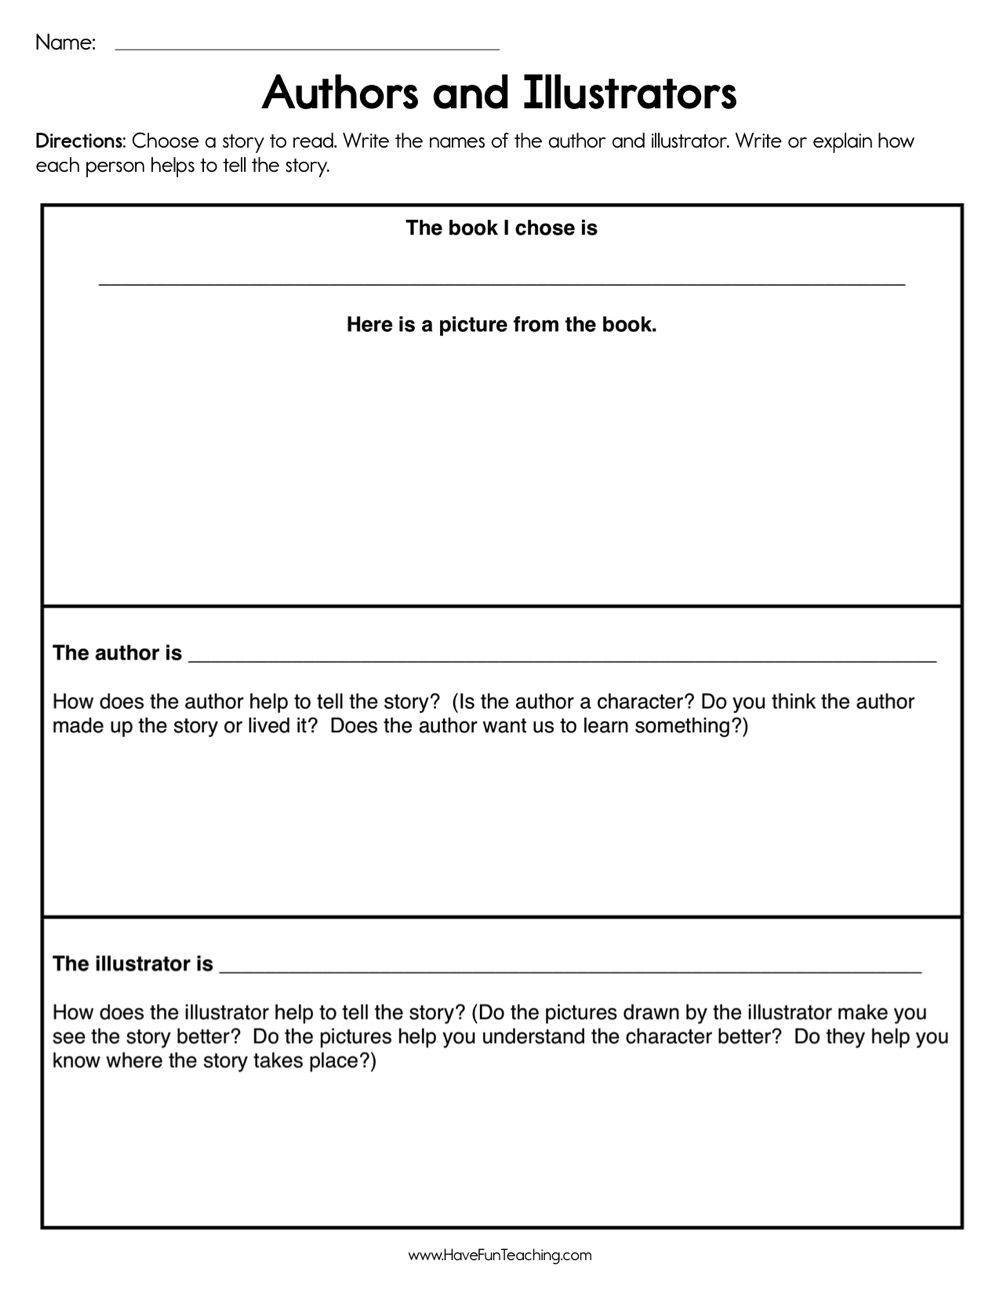 Author And Illustrators Worksheet In 2020 Authors Purpose Activities Authors Purpose Have Fun Teaching